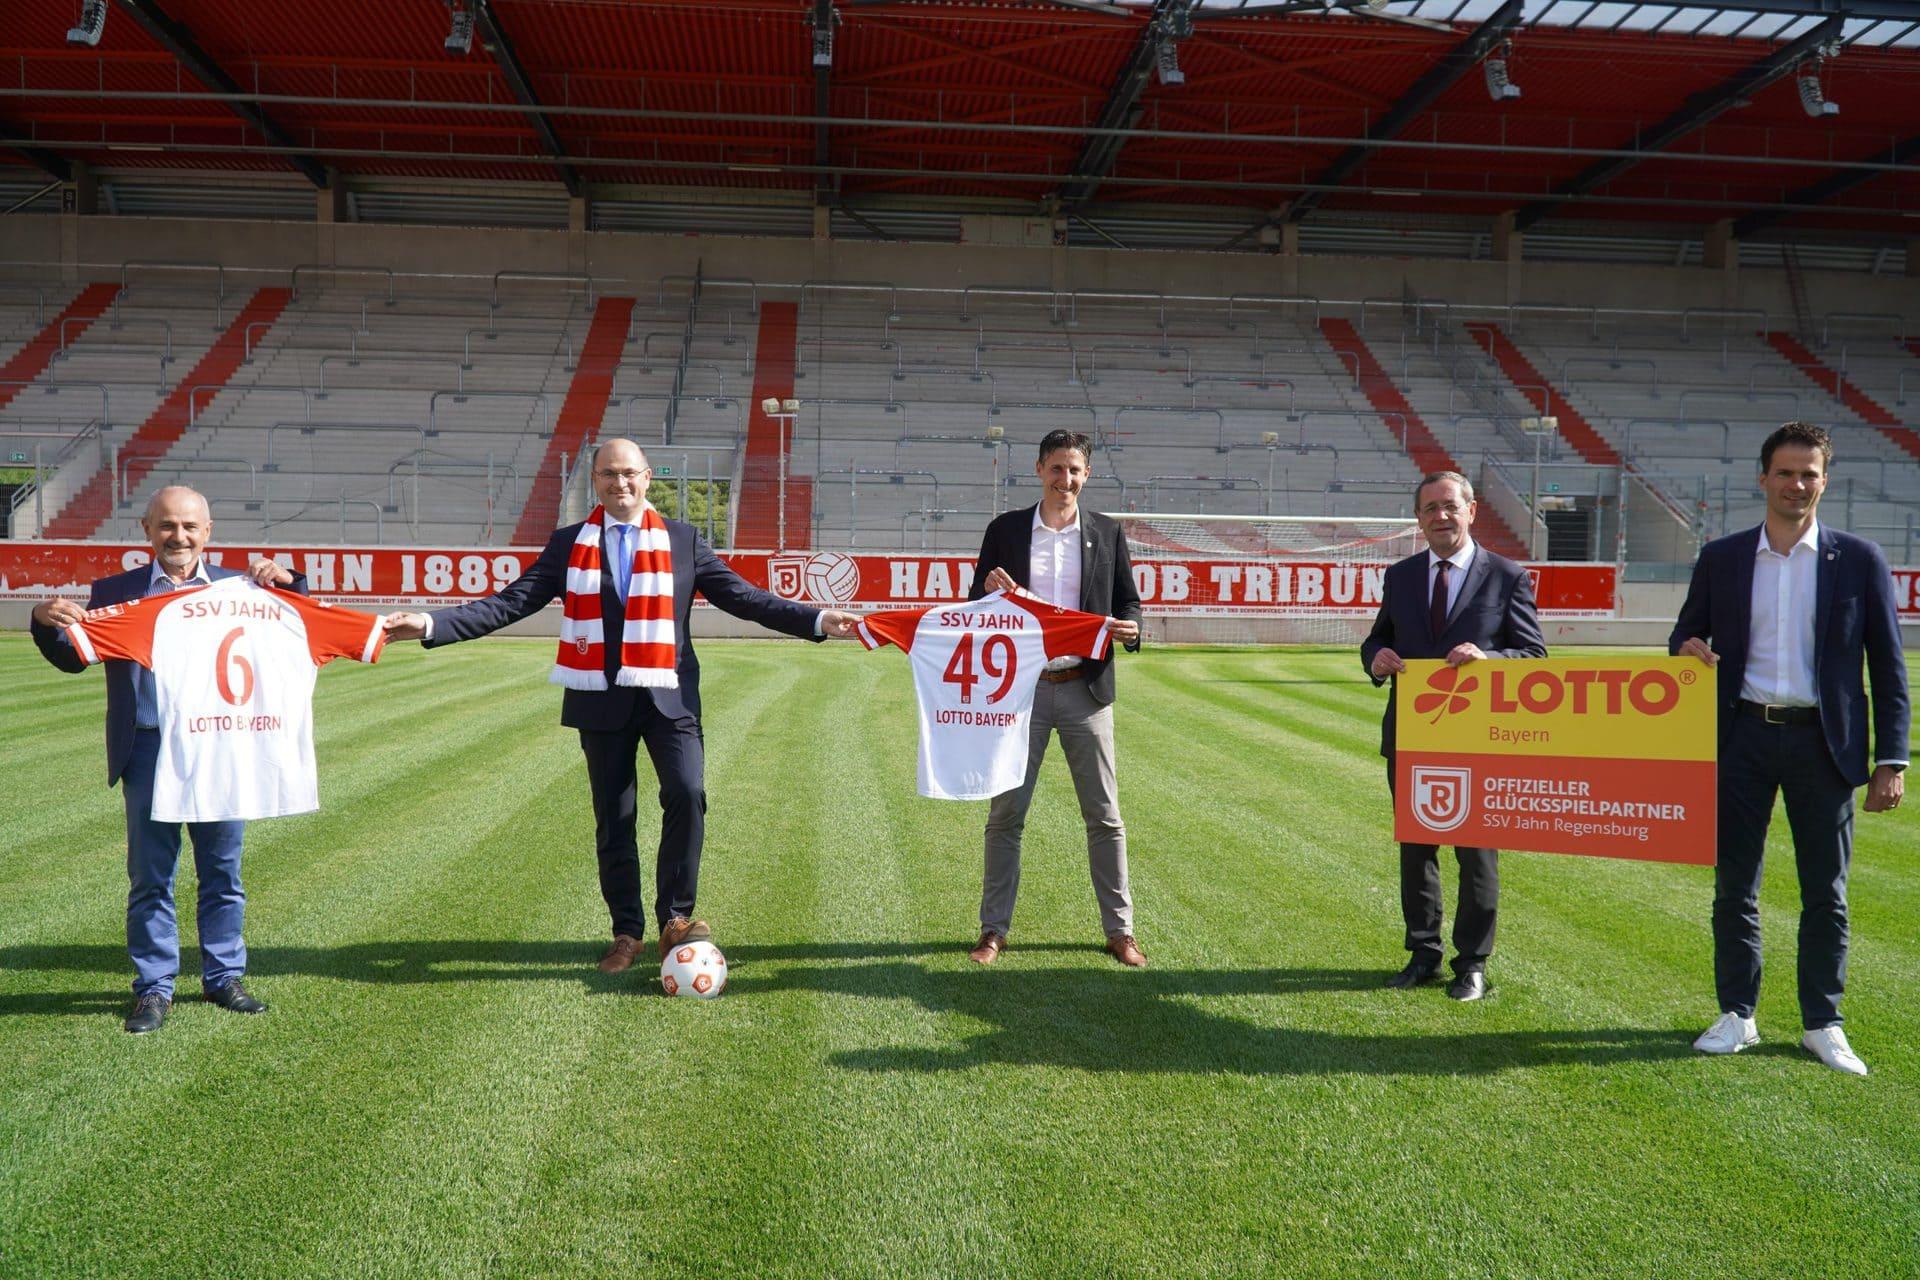 LOTTO Bayern verlängert Sponsoring beim SSV Jahn 2. Bundesliga